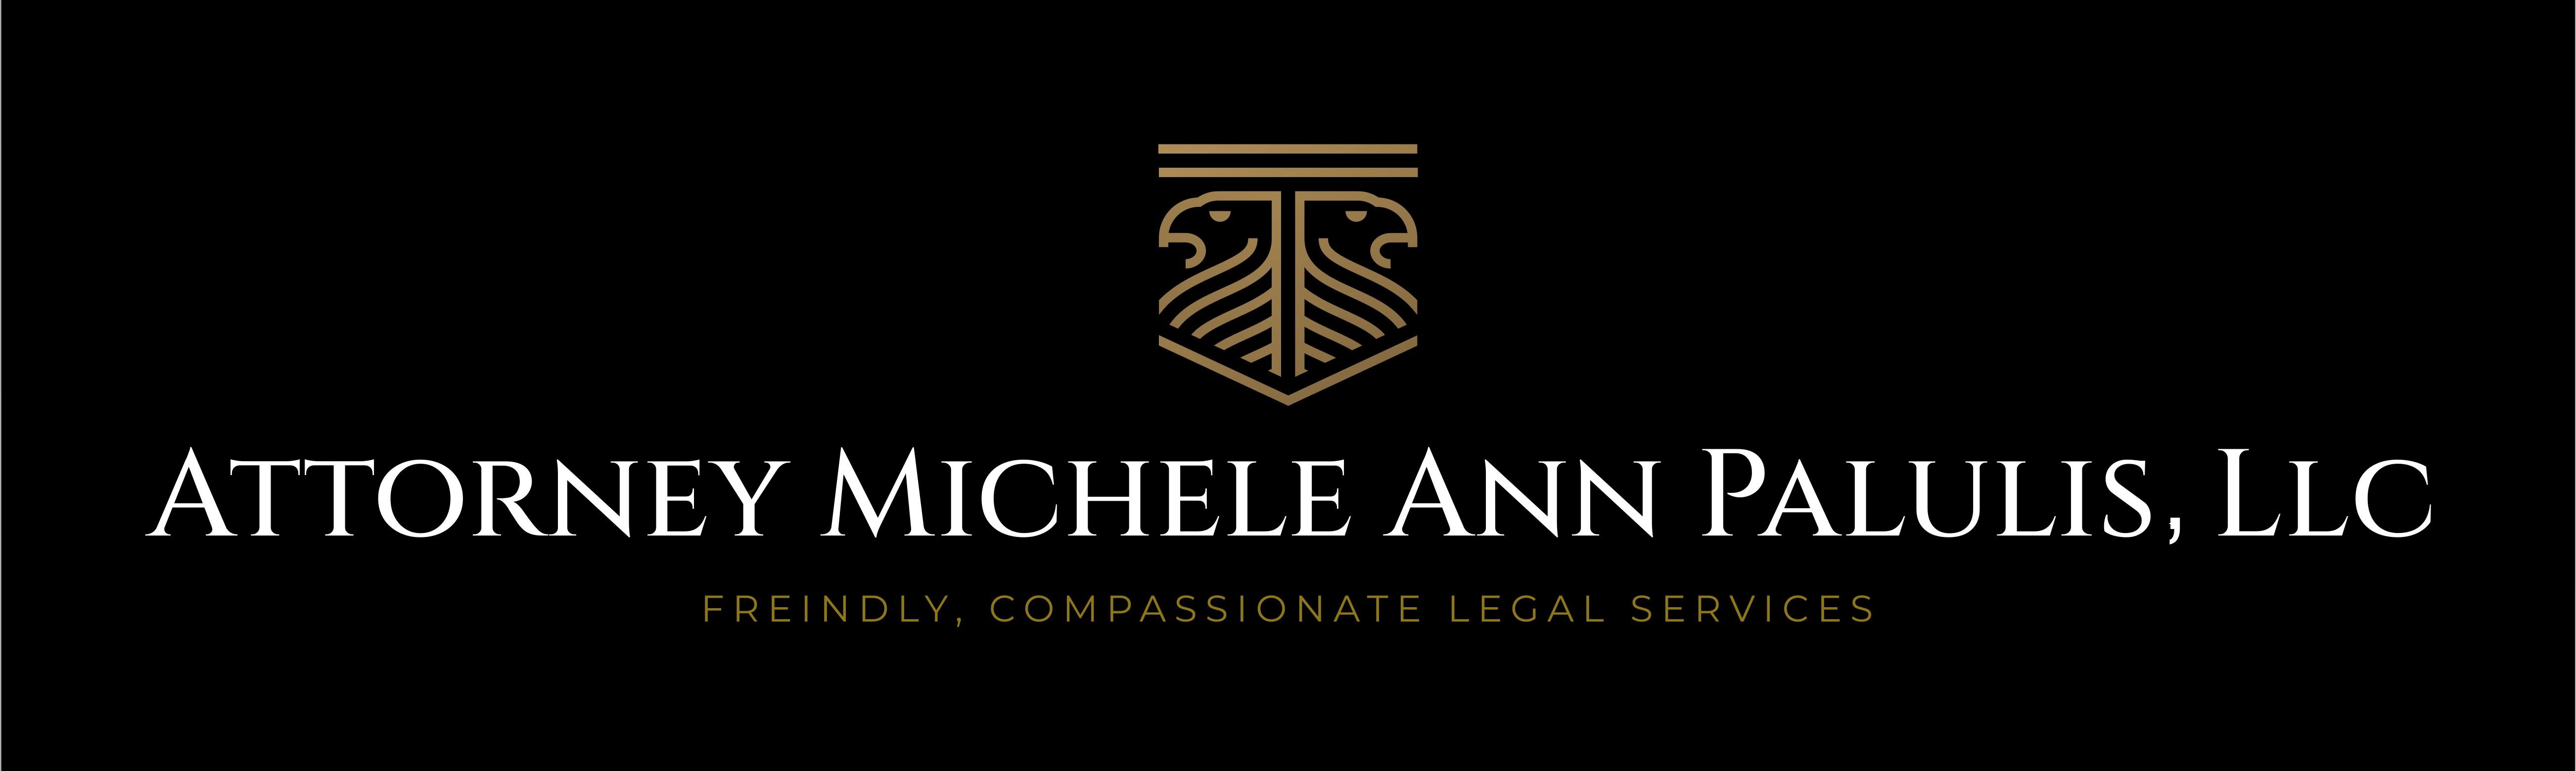 www.attorneypalulis.com